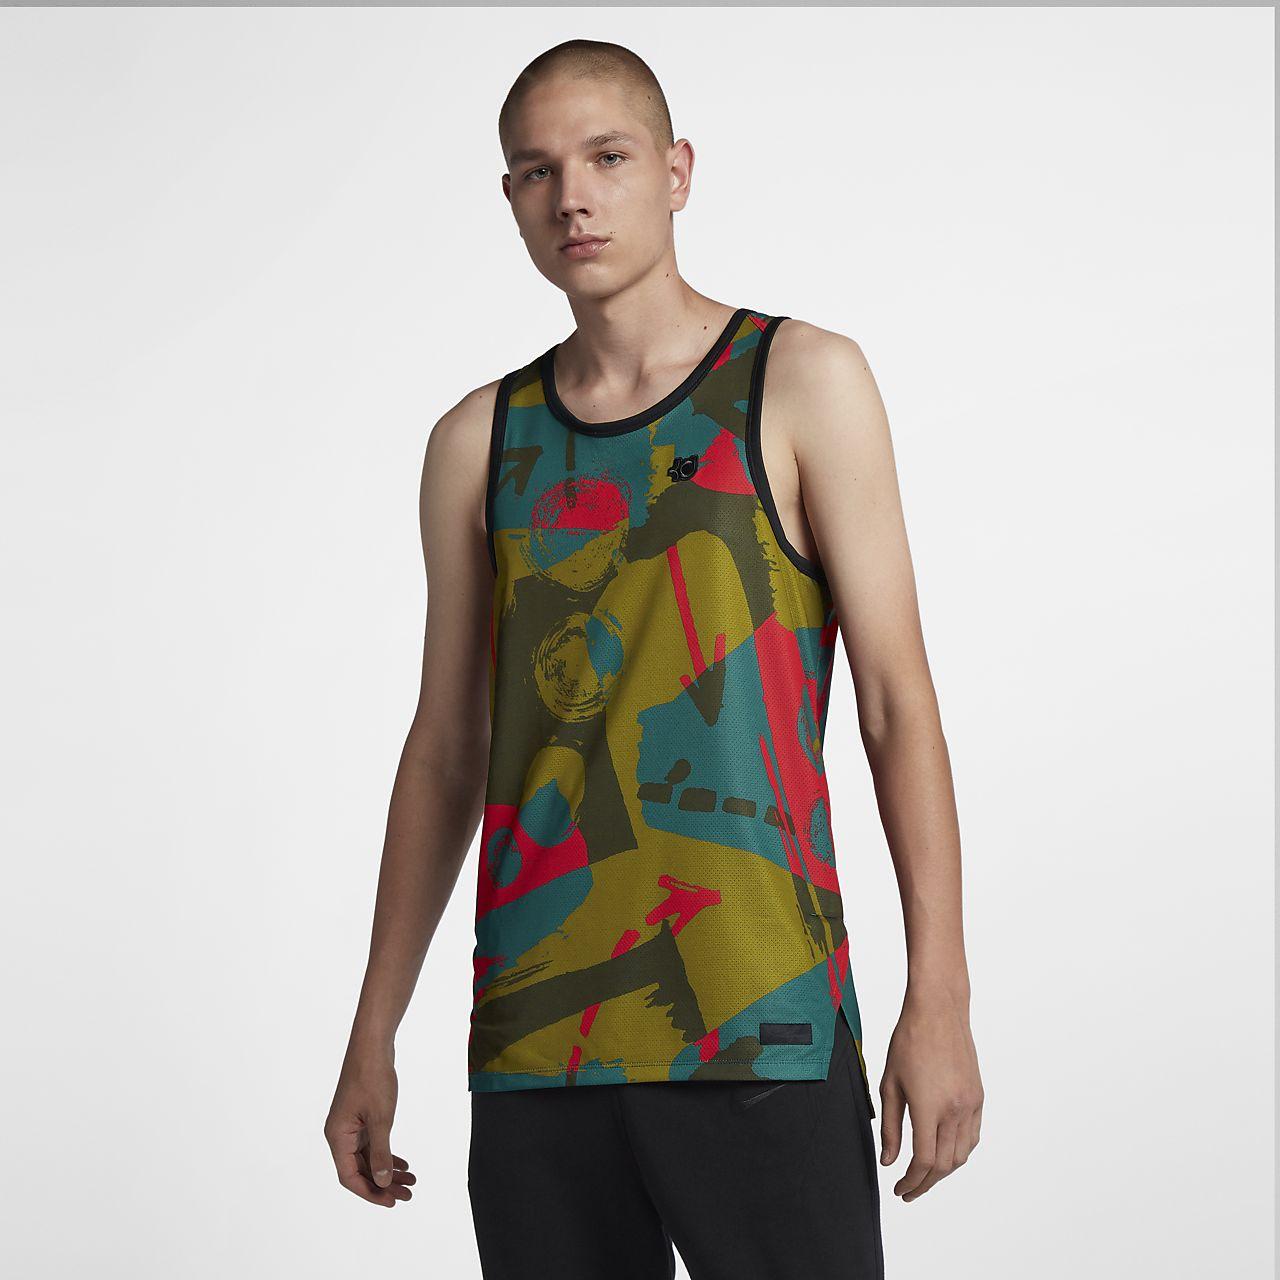 8ad3920b2bffe Nike KD Hyper Elite Men s Basketball Tank. Nike.com LU